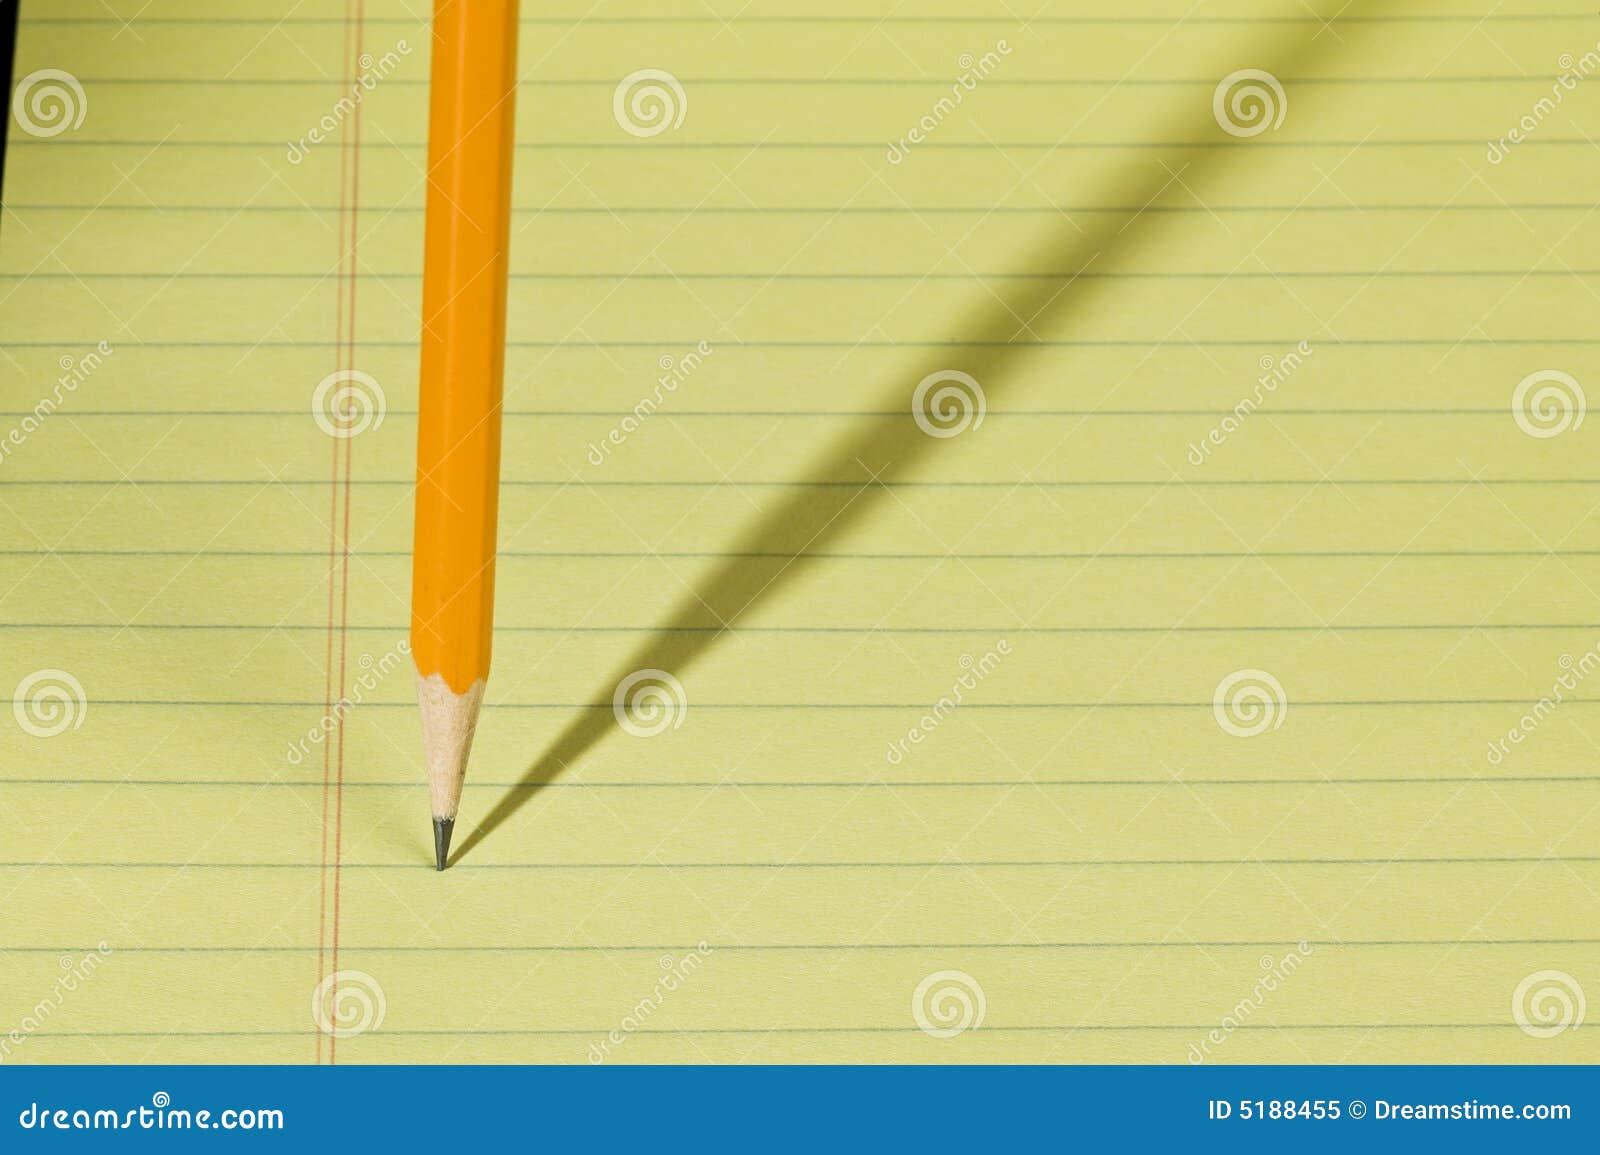 Sat essay grade scale